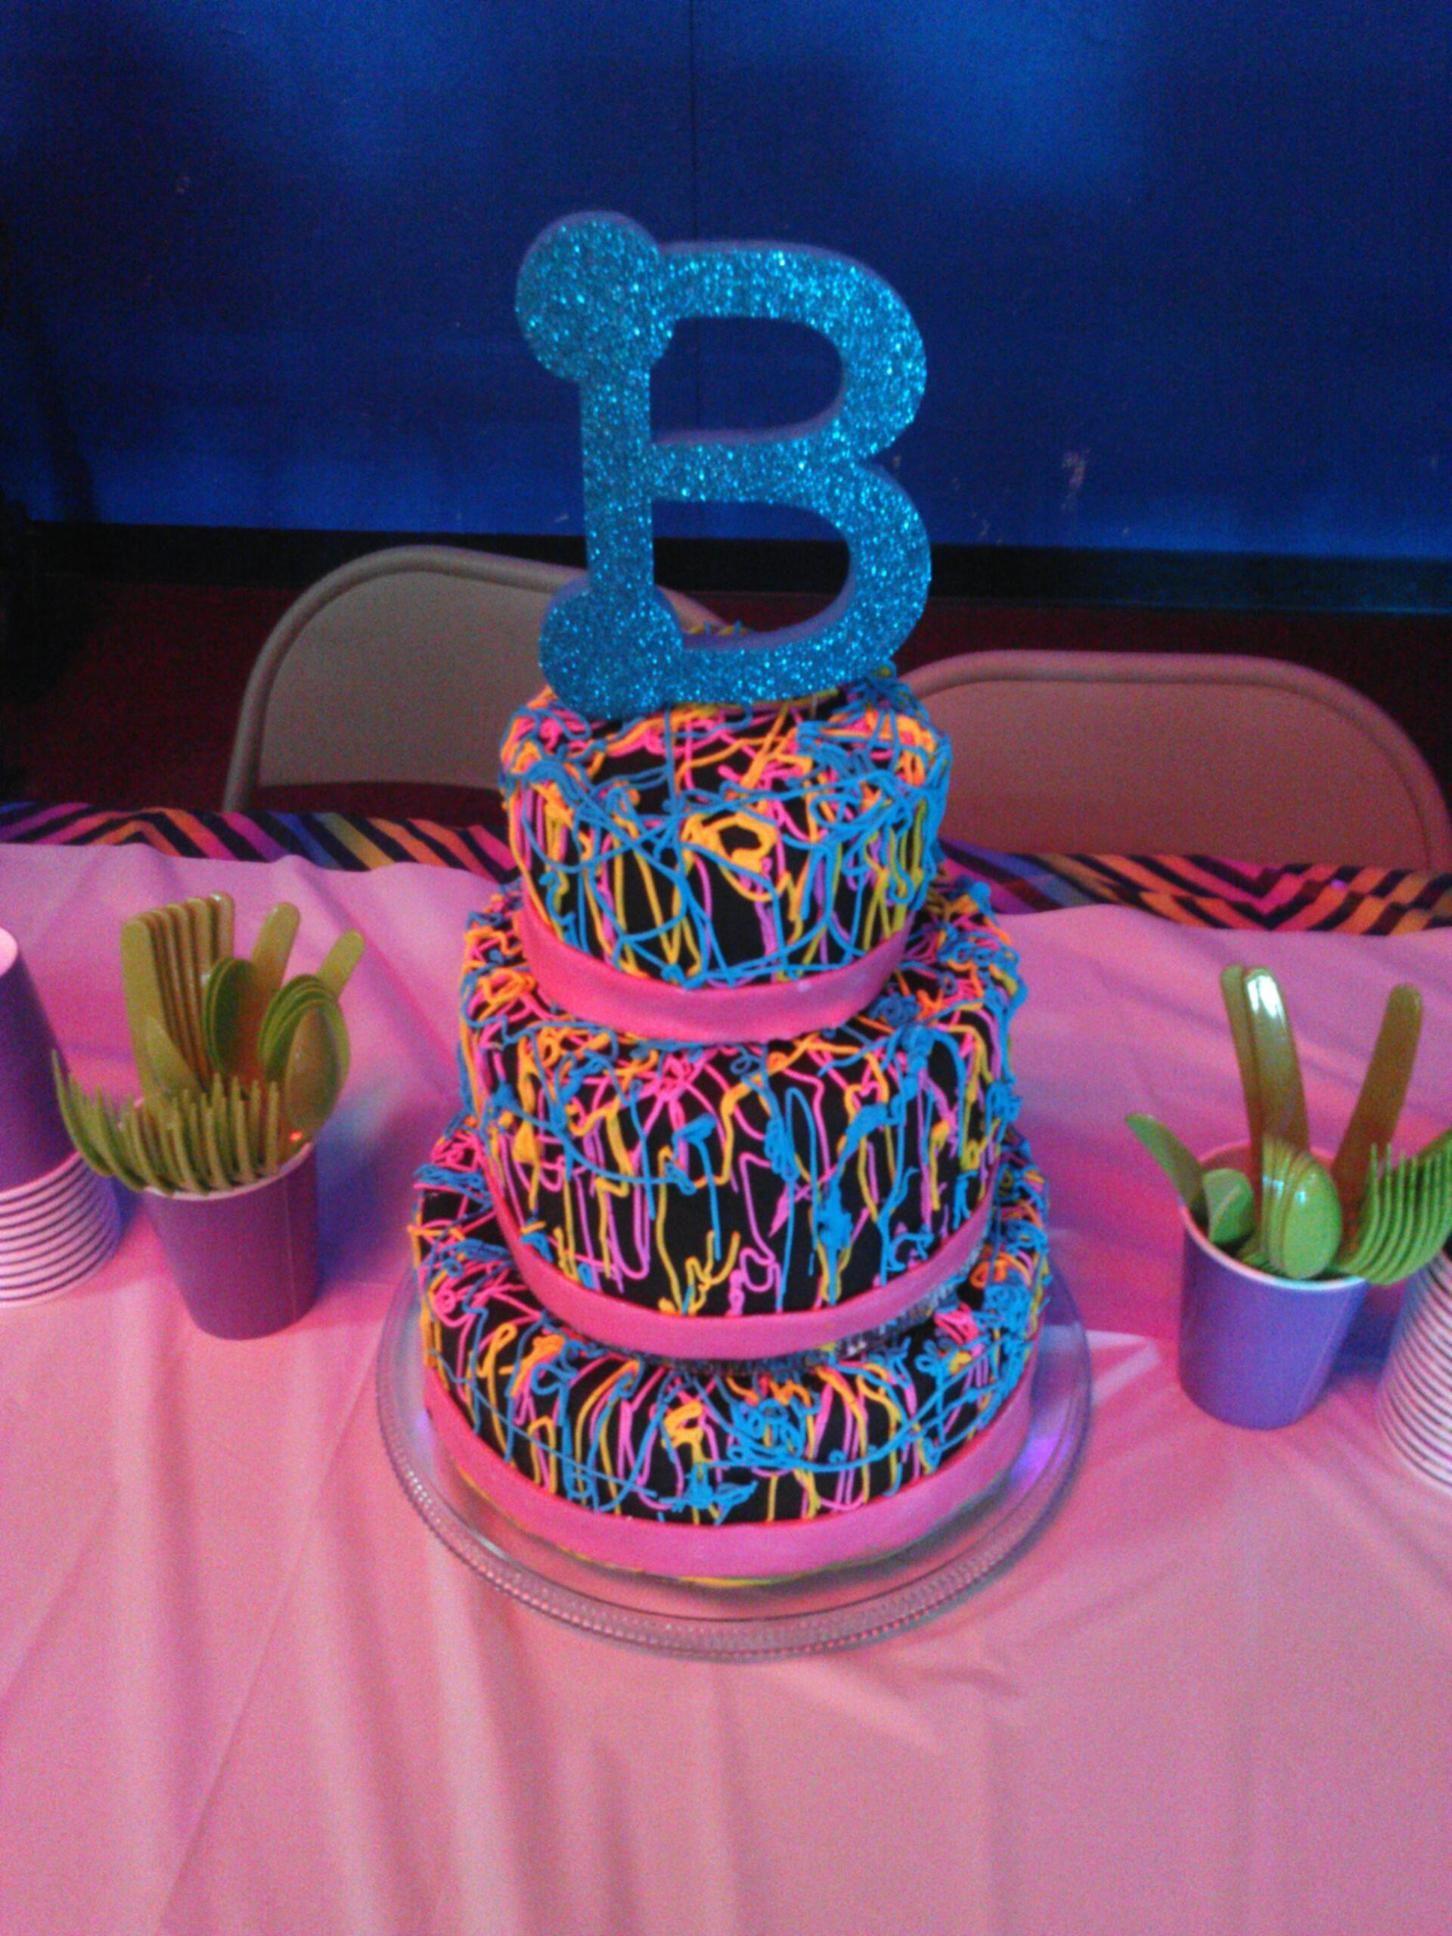 Neon And Black Birthday Cake Cakes By Barbara Pinterest - Birthday cake barbara